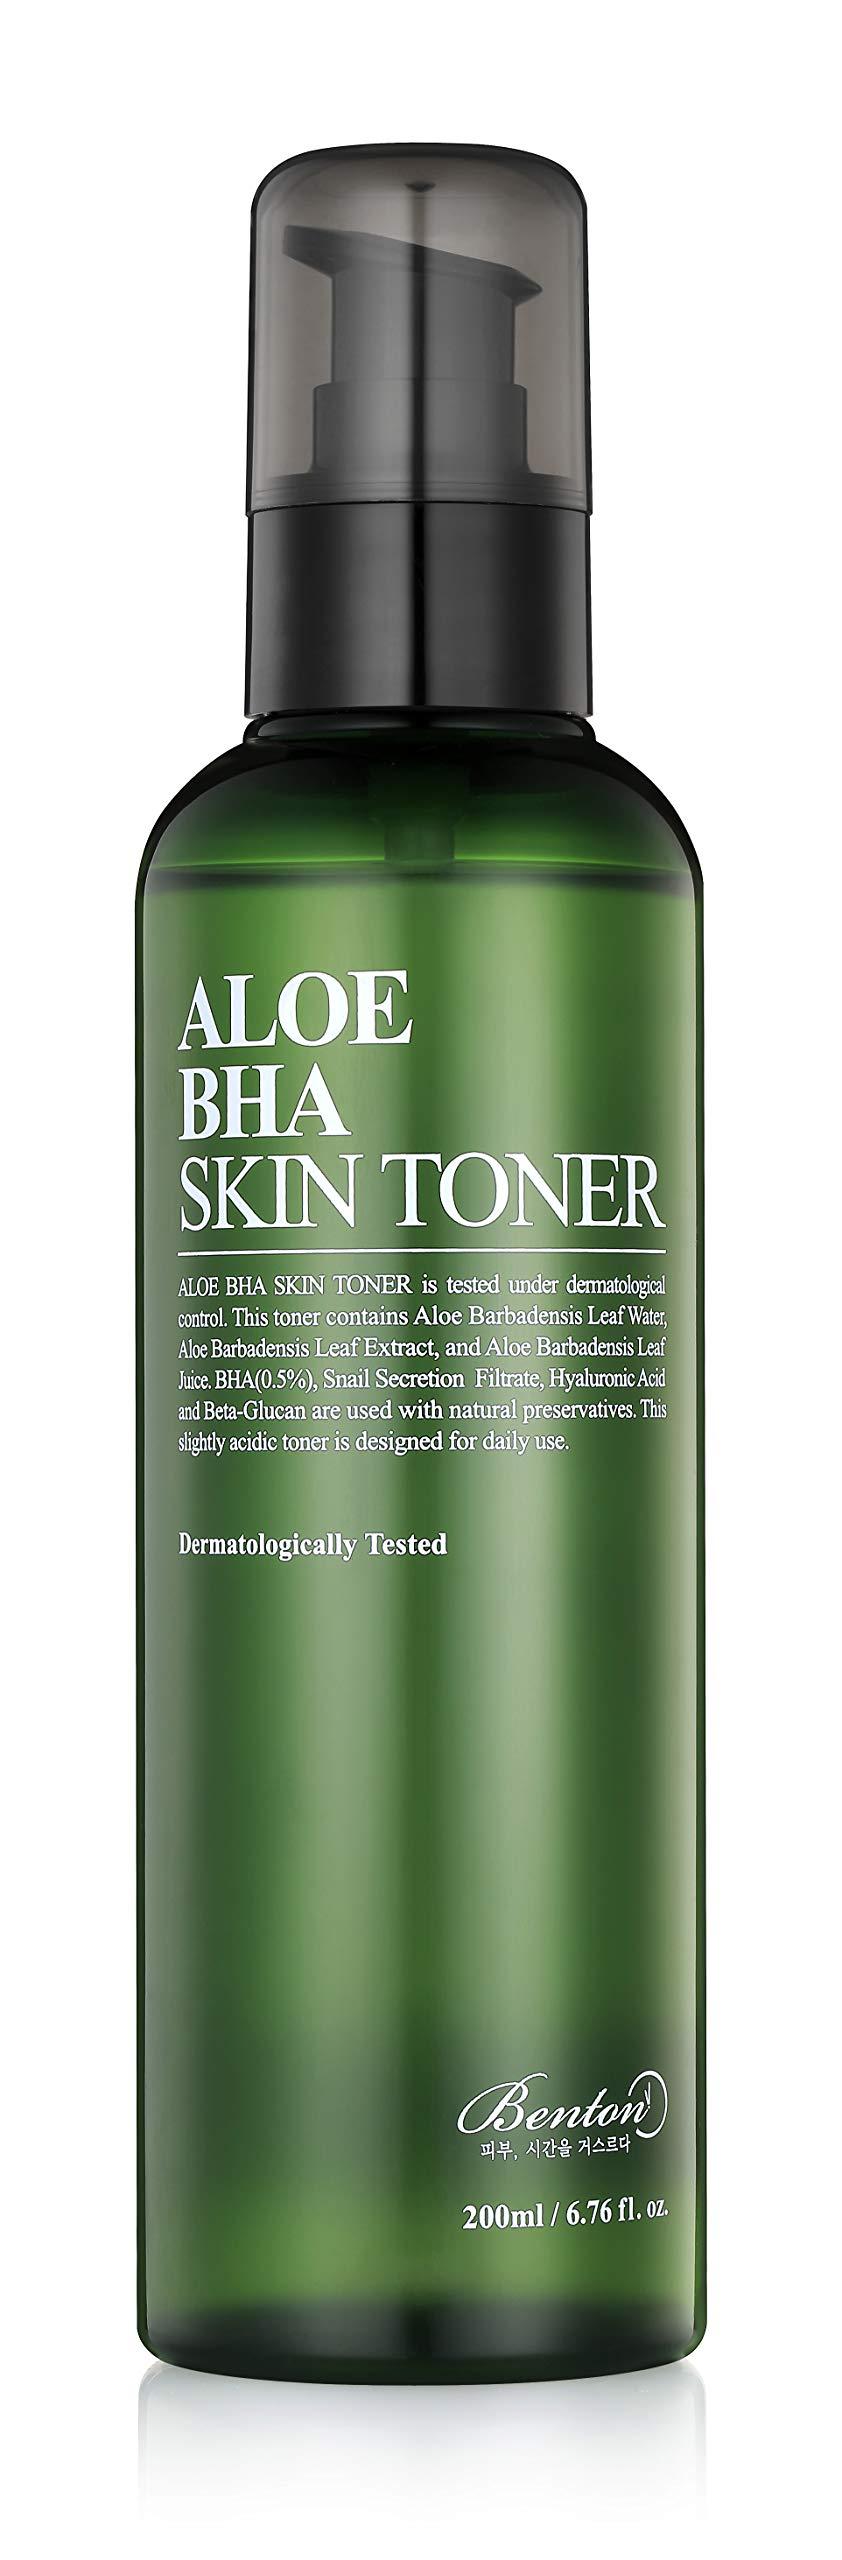 BENTON Aloe BHA Skin Toner by Benton